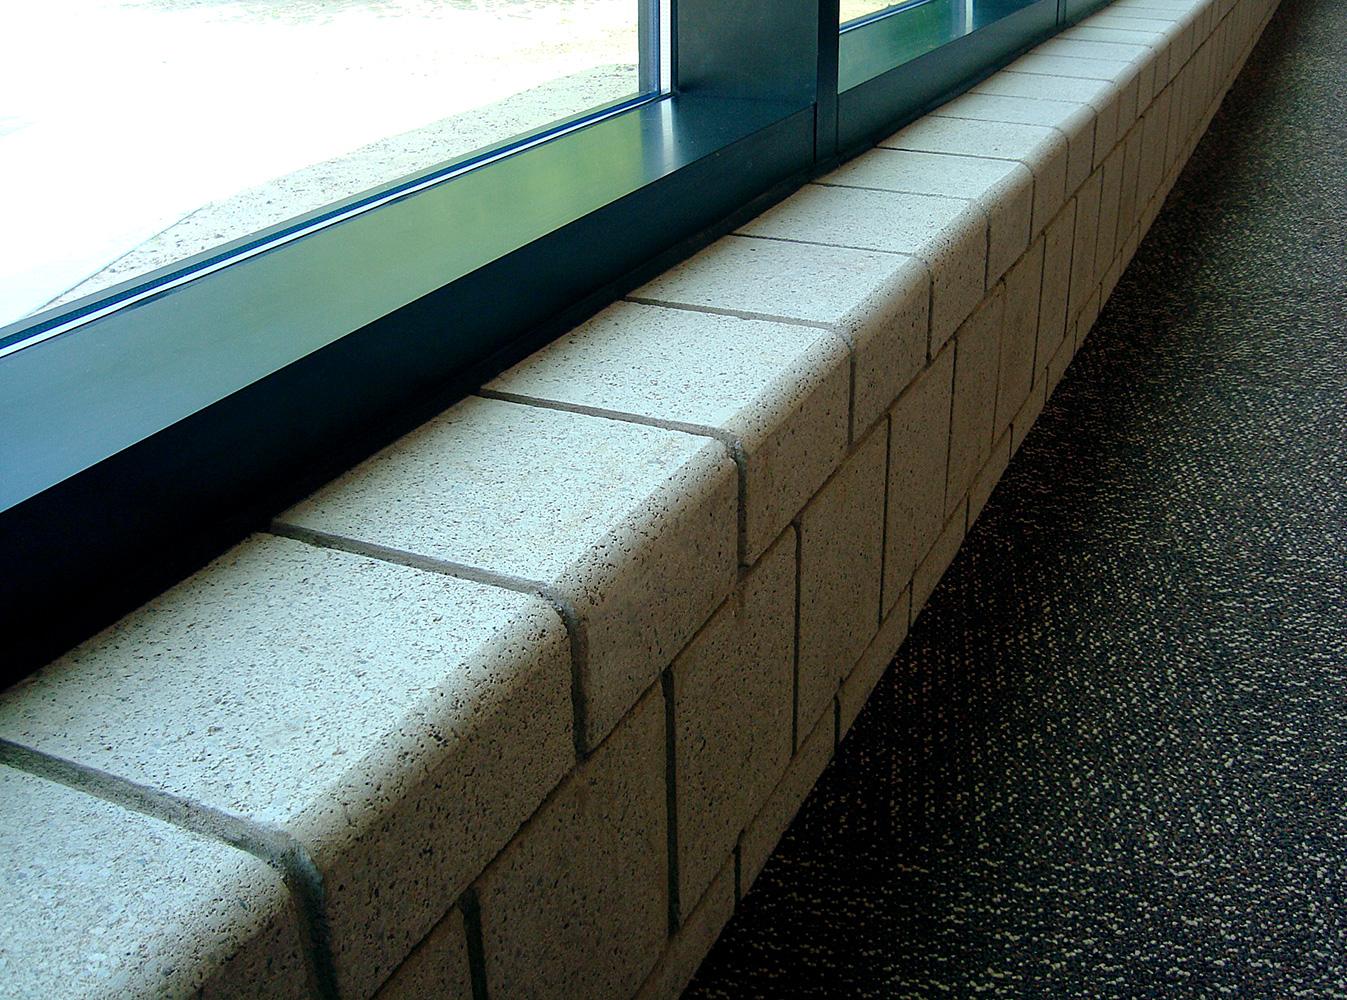 grand-rapids-michigan-certified-concrete-varigrind-gallery-21.jpg